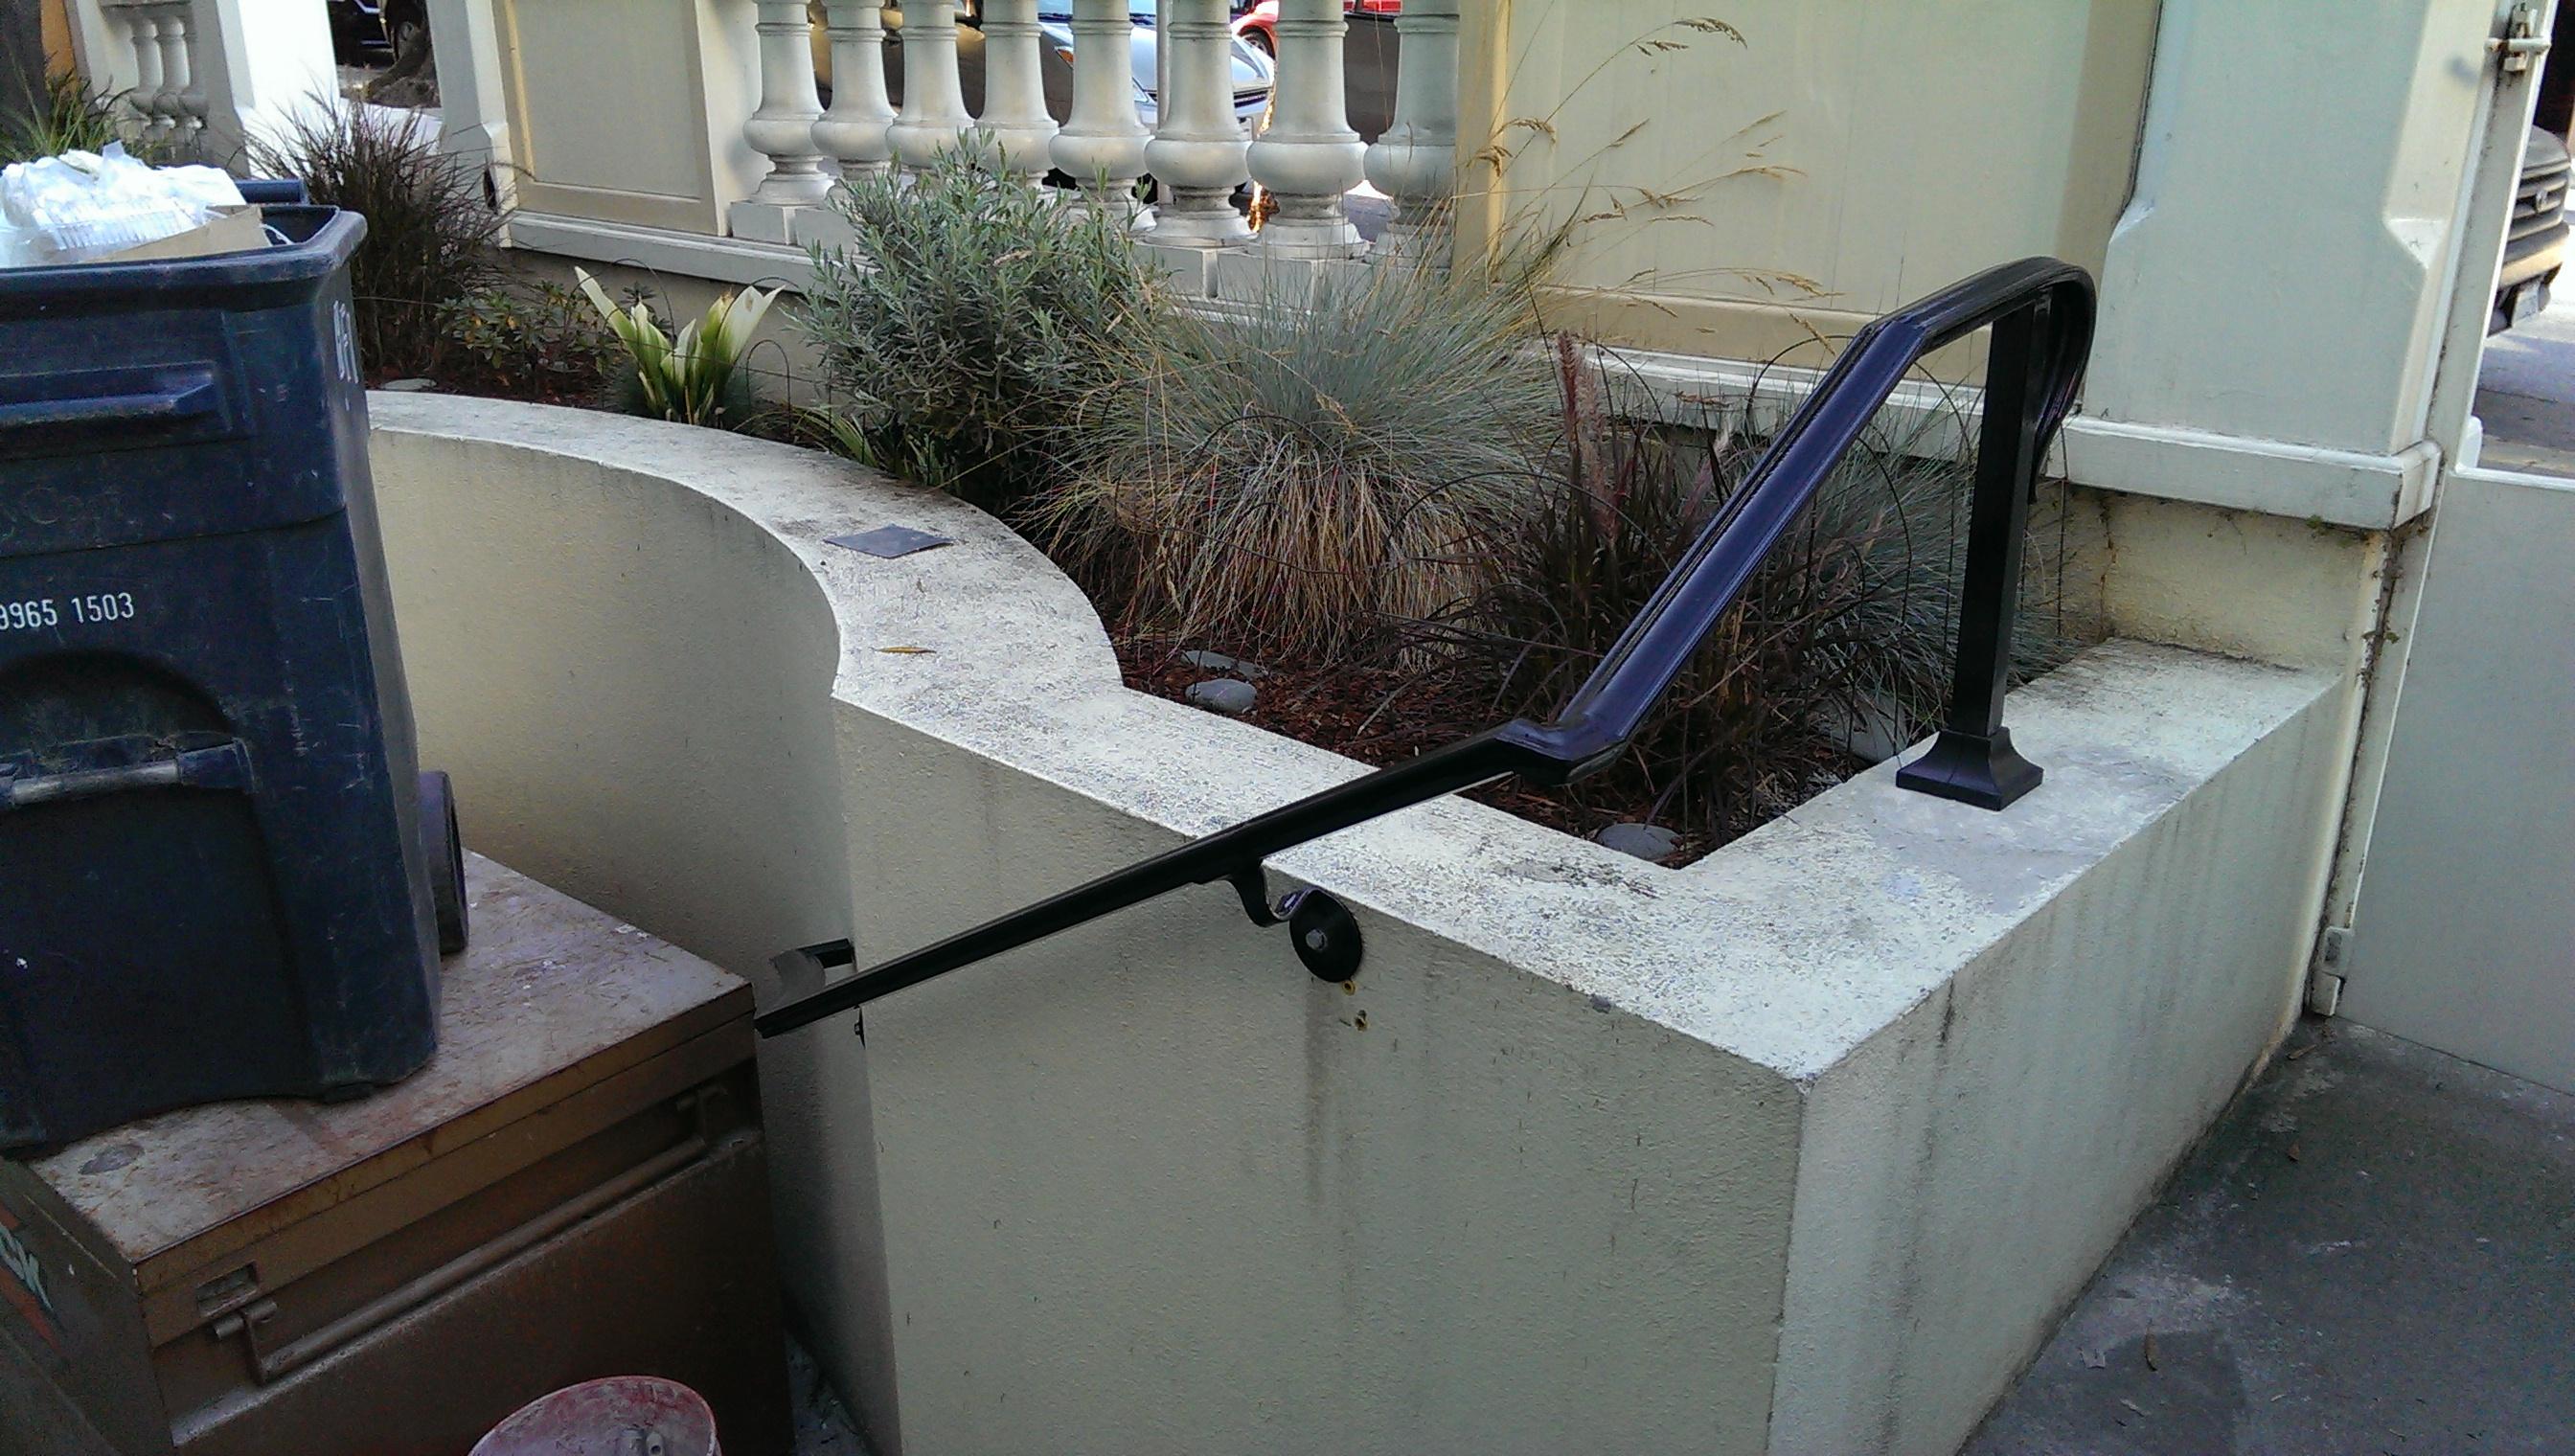 Handrail Example 3 (Molded Cap, sometimes referred to as Mushroom Cap)